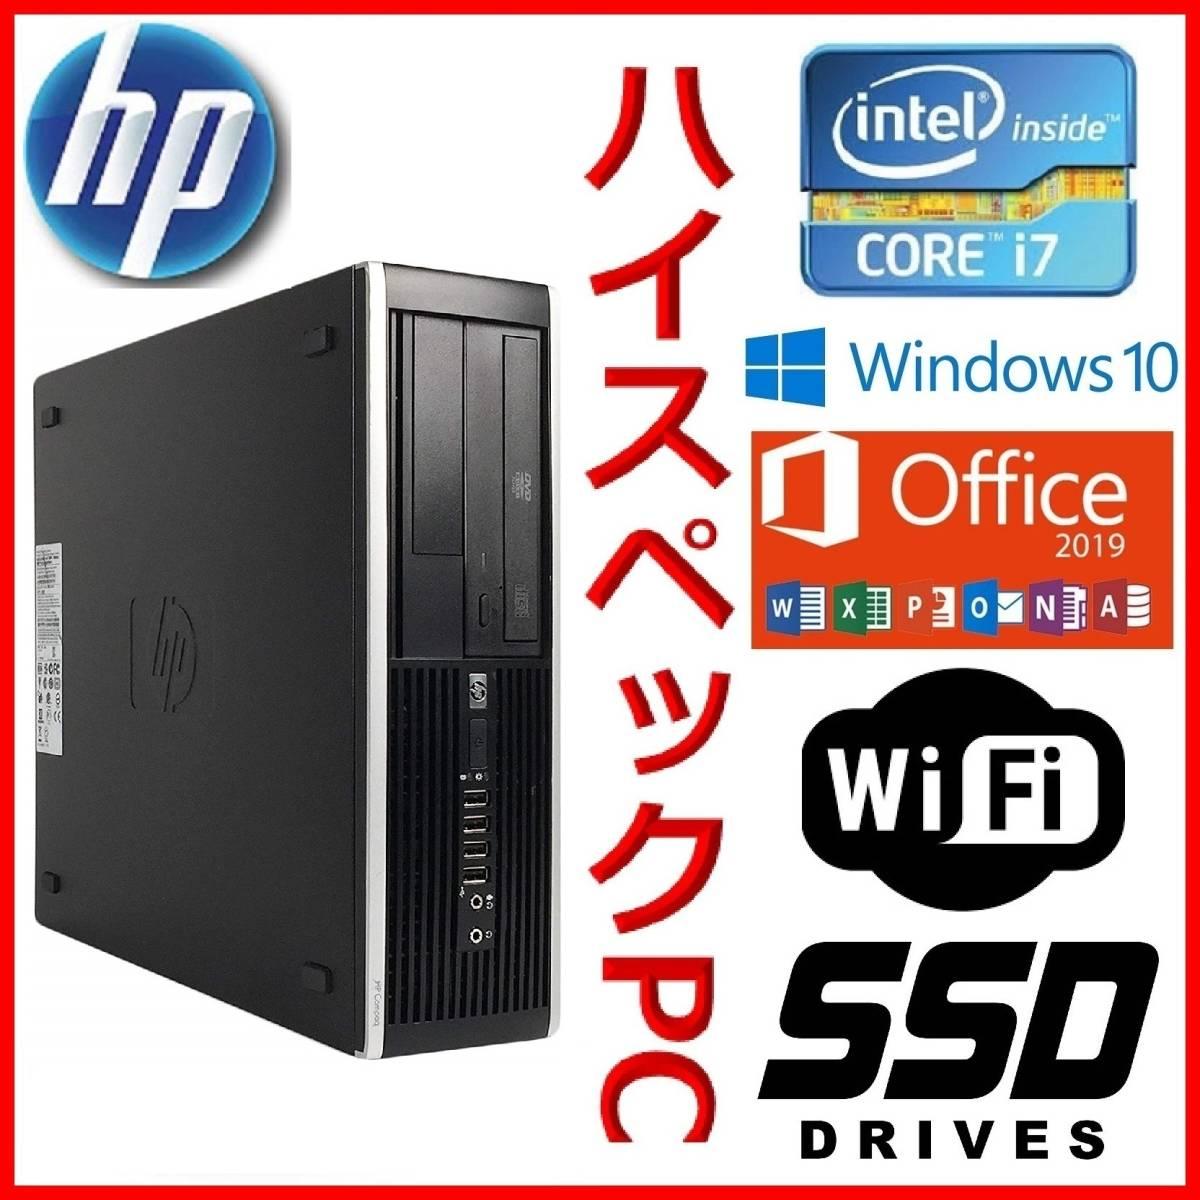 ▼小型▼超高速 i7(3.8Gx8)/新品SSD240GB+HDD1TB/8GBメモリ/Office2019/Win10/無線LAN(Wi